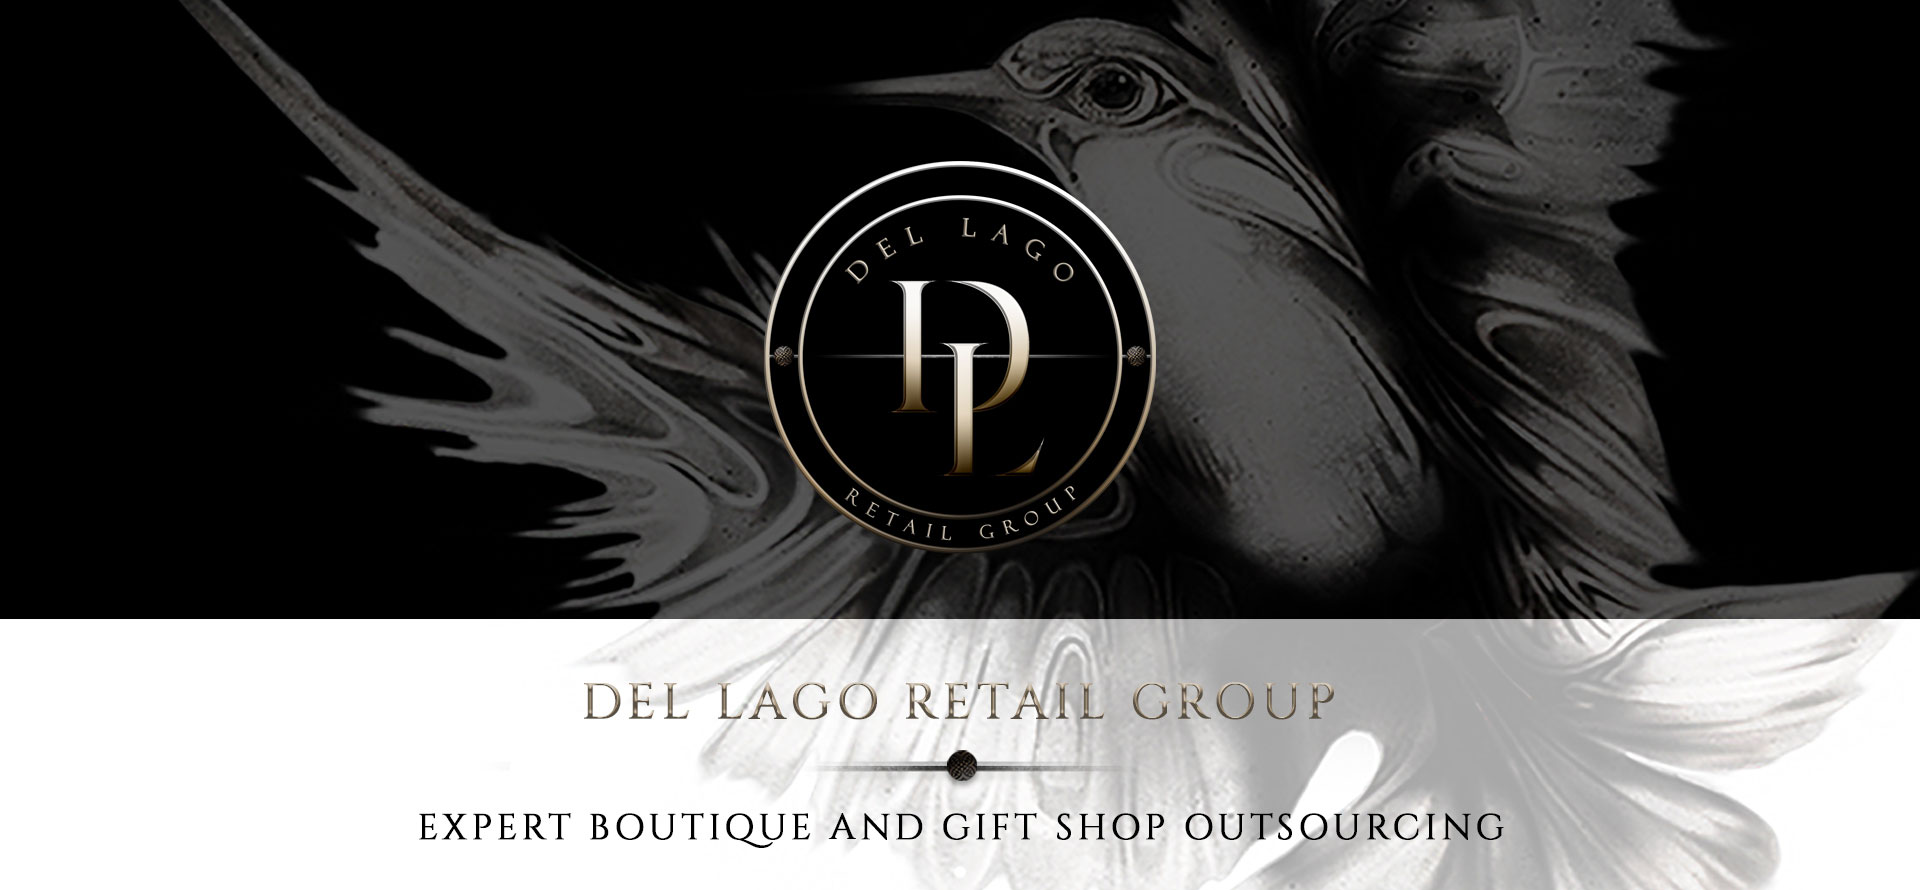 Del Lago Retail Group